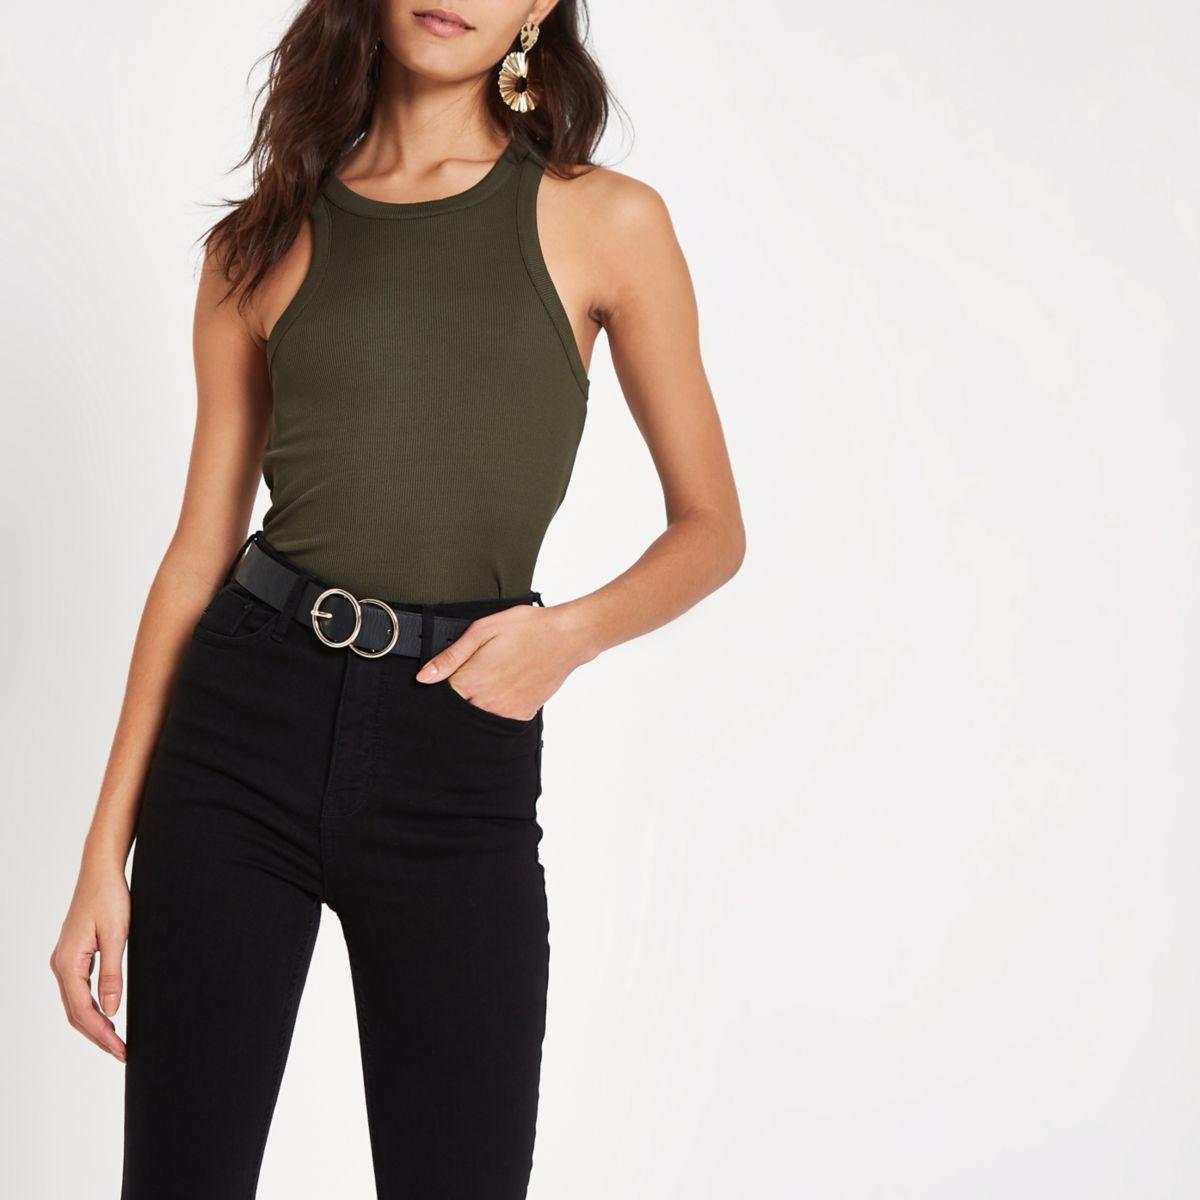 Khaki green ribbed cut away vest